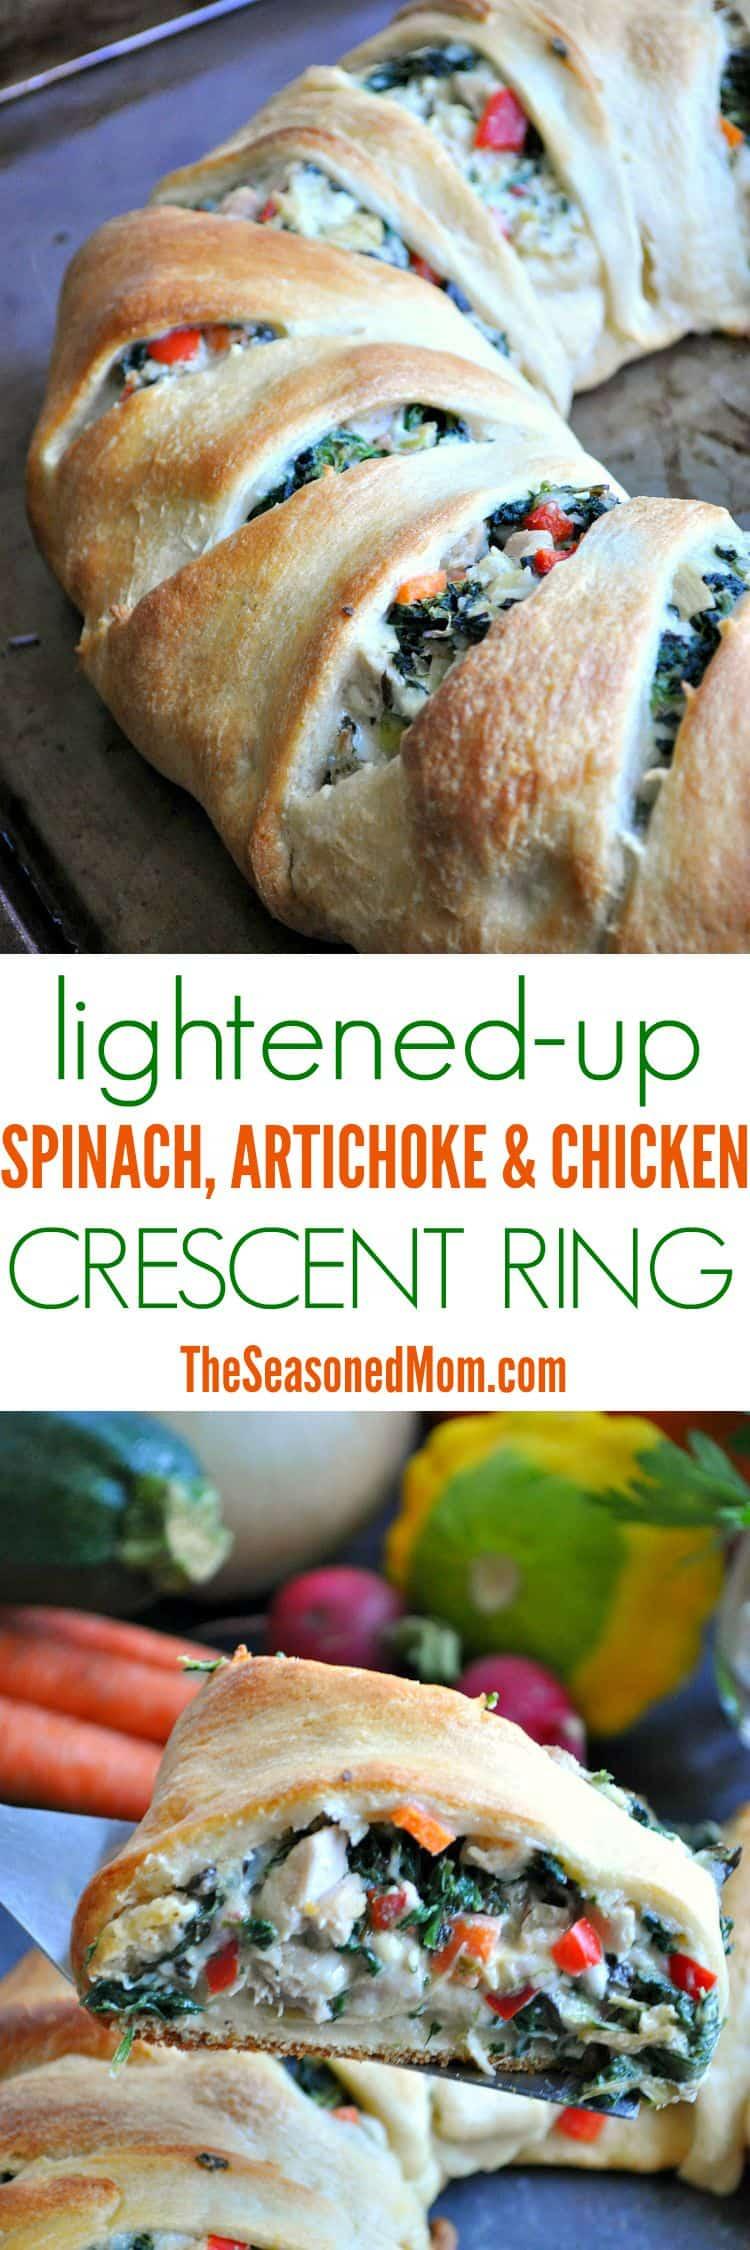 Lightened Up Spinach Artichoke & Chicken Crescent Ring